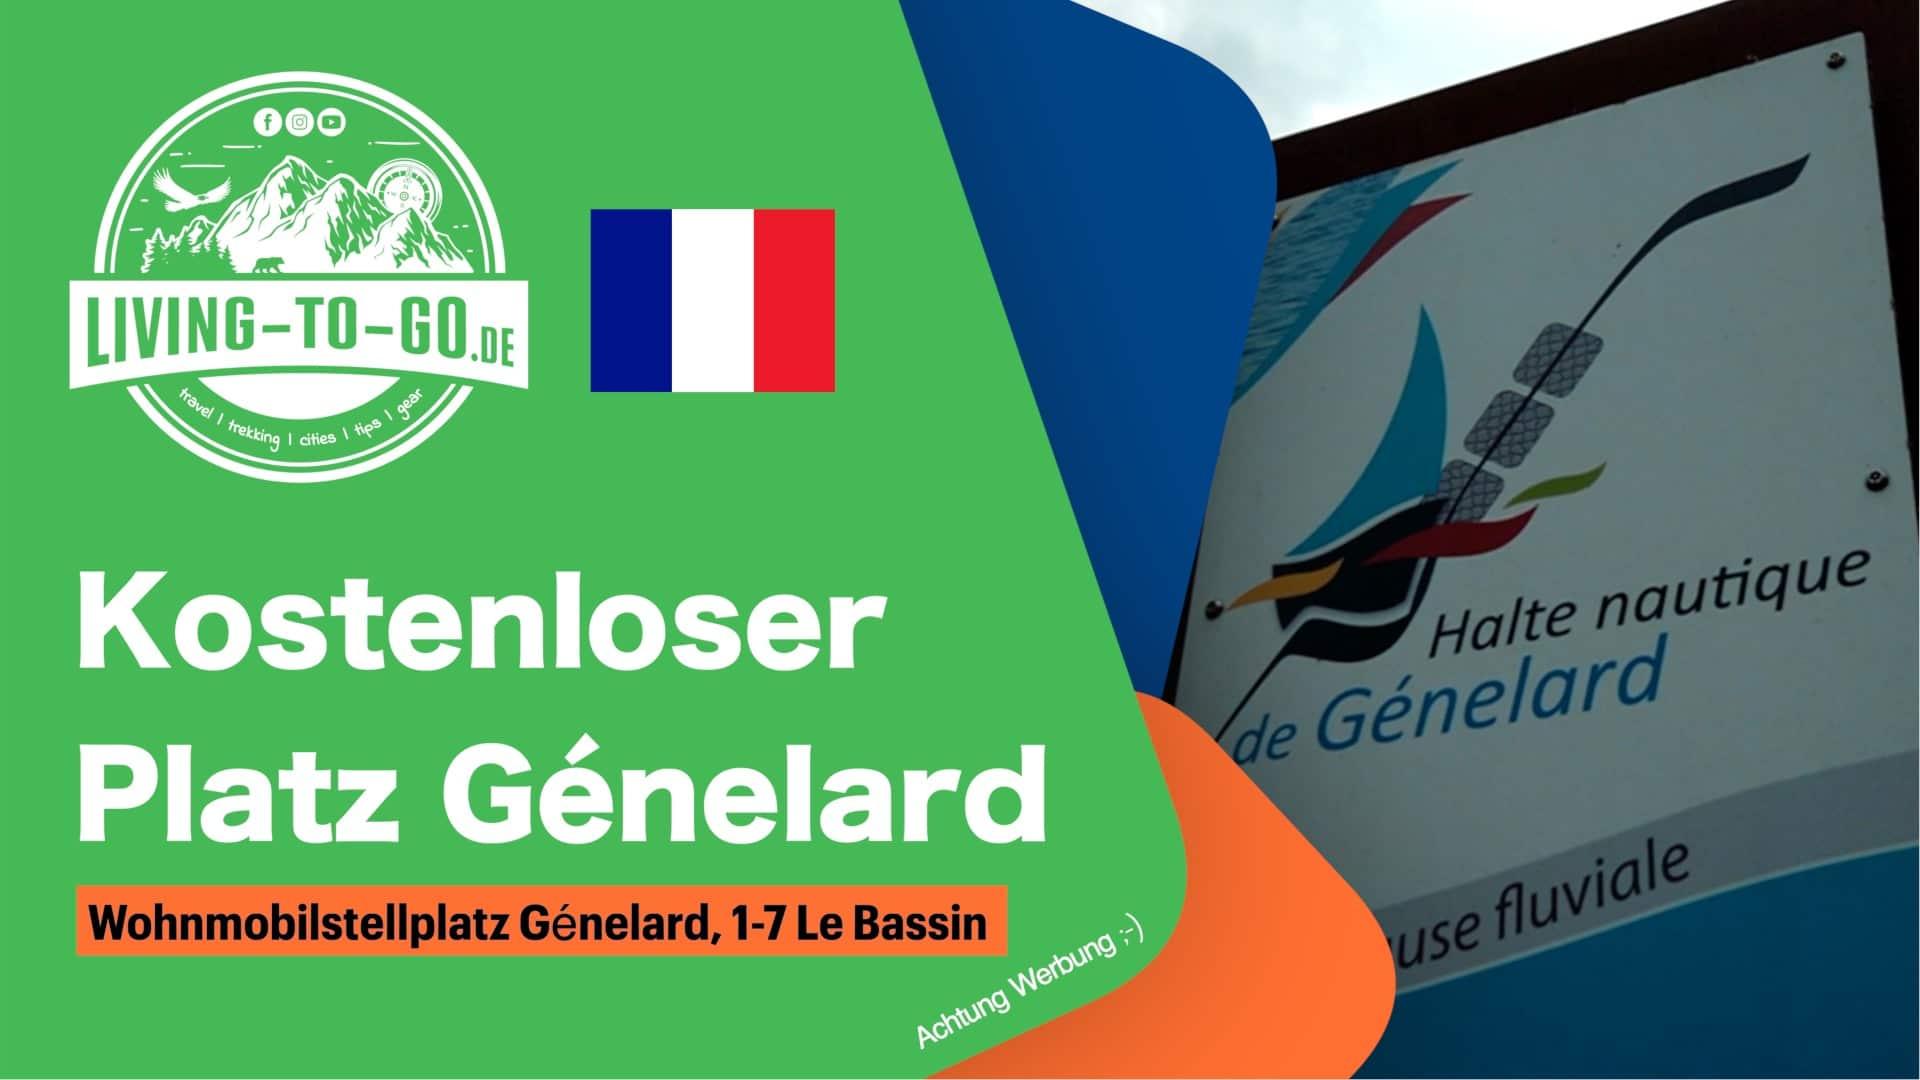 Wohnmobilstellplatz Génelard, 1-7 Le Bassin